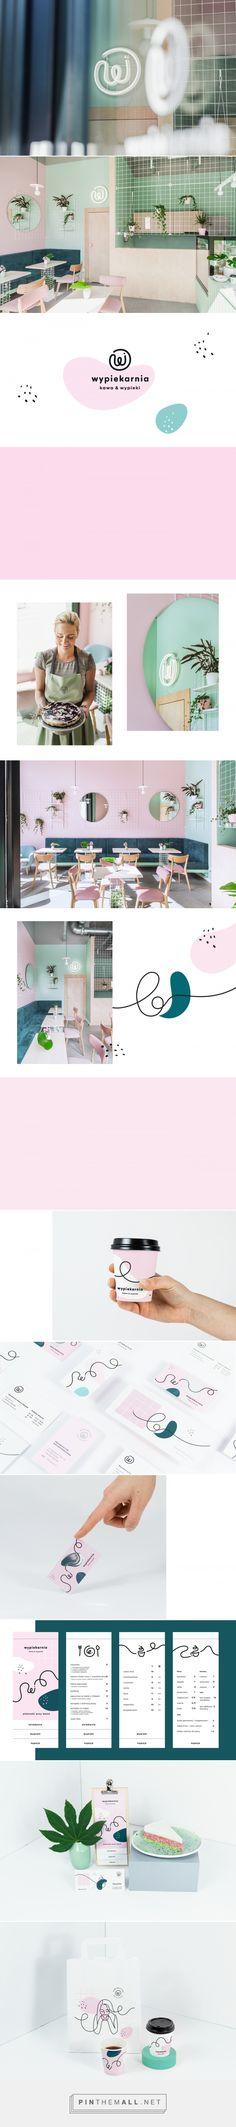 Lovely Brand Design for Wypiekarnia Cafe & Bakery on Behance - created via https://pinthemall.net